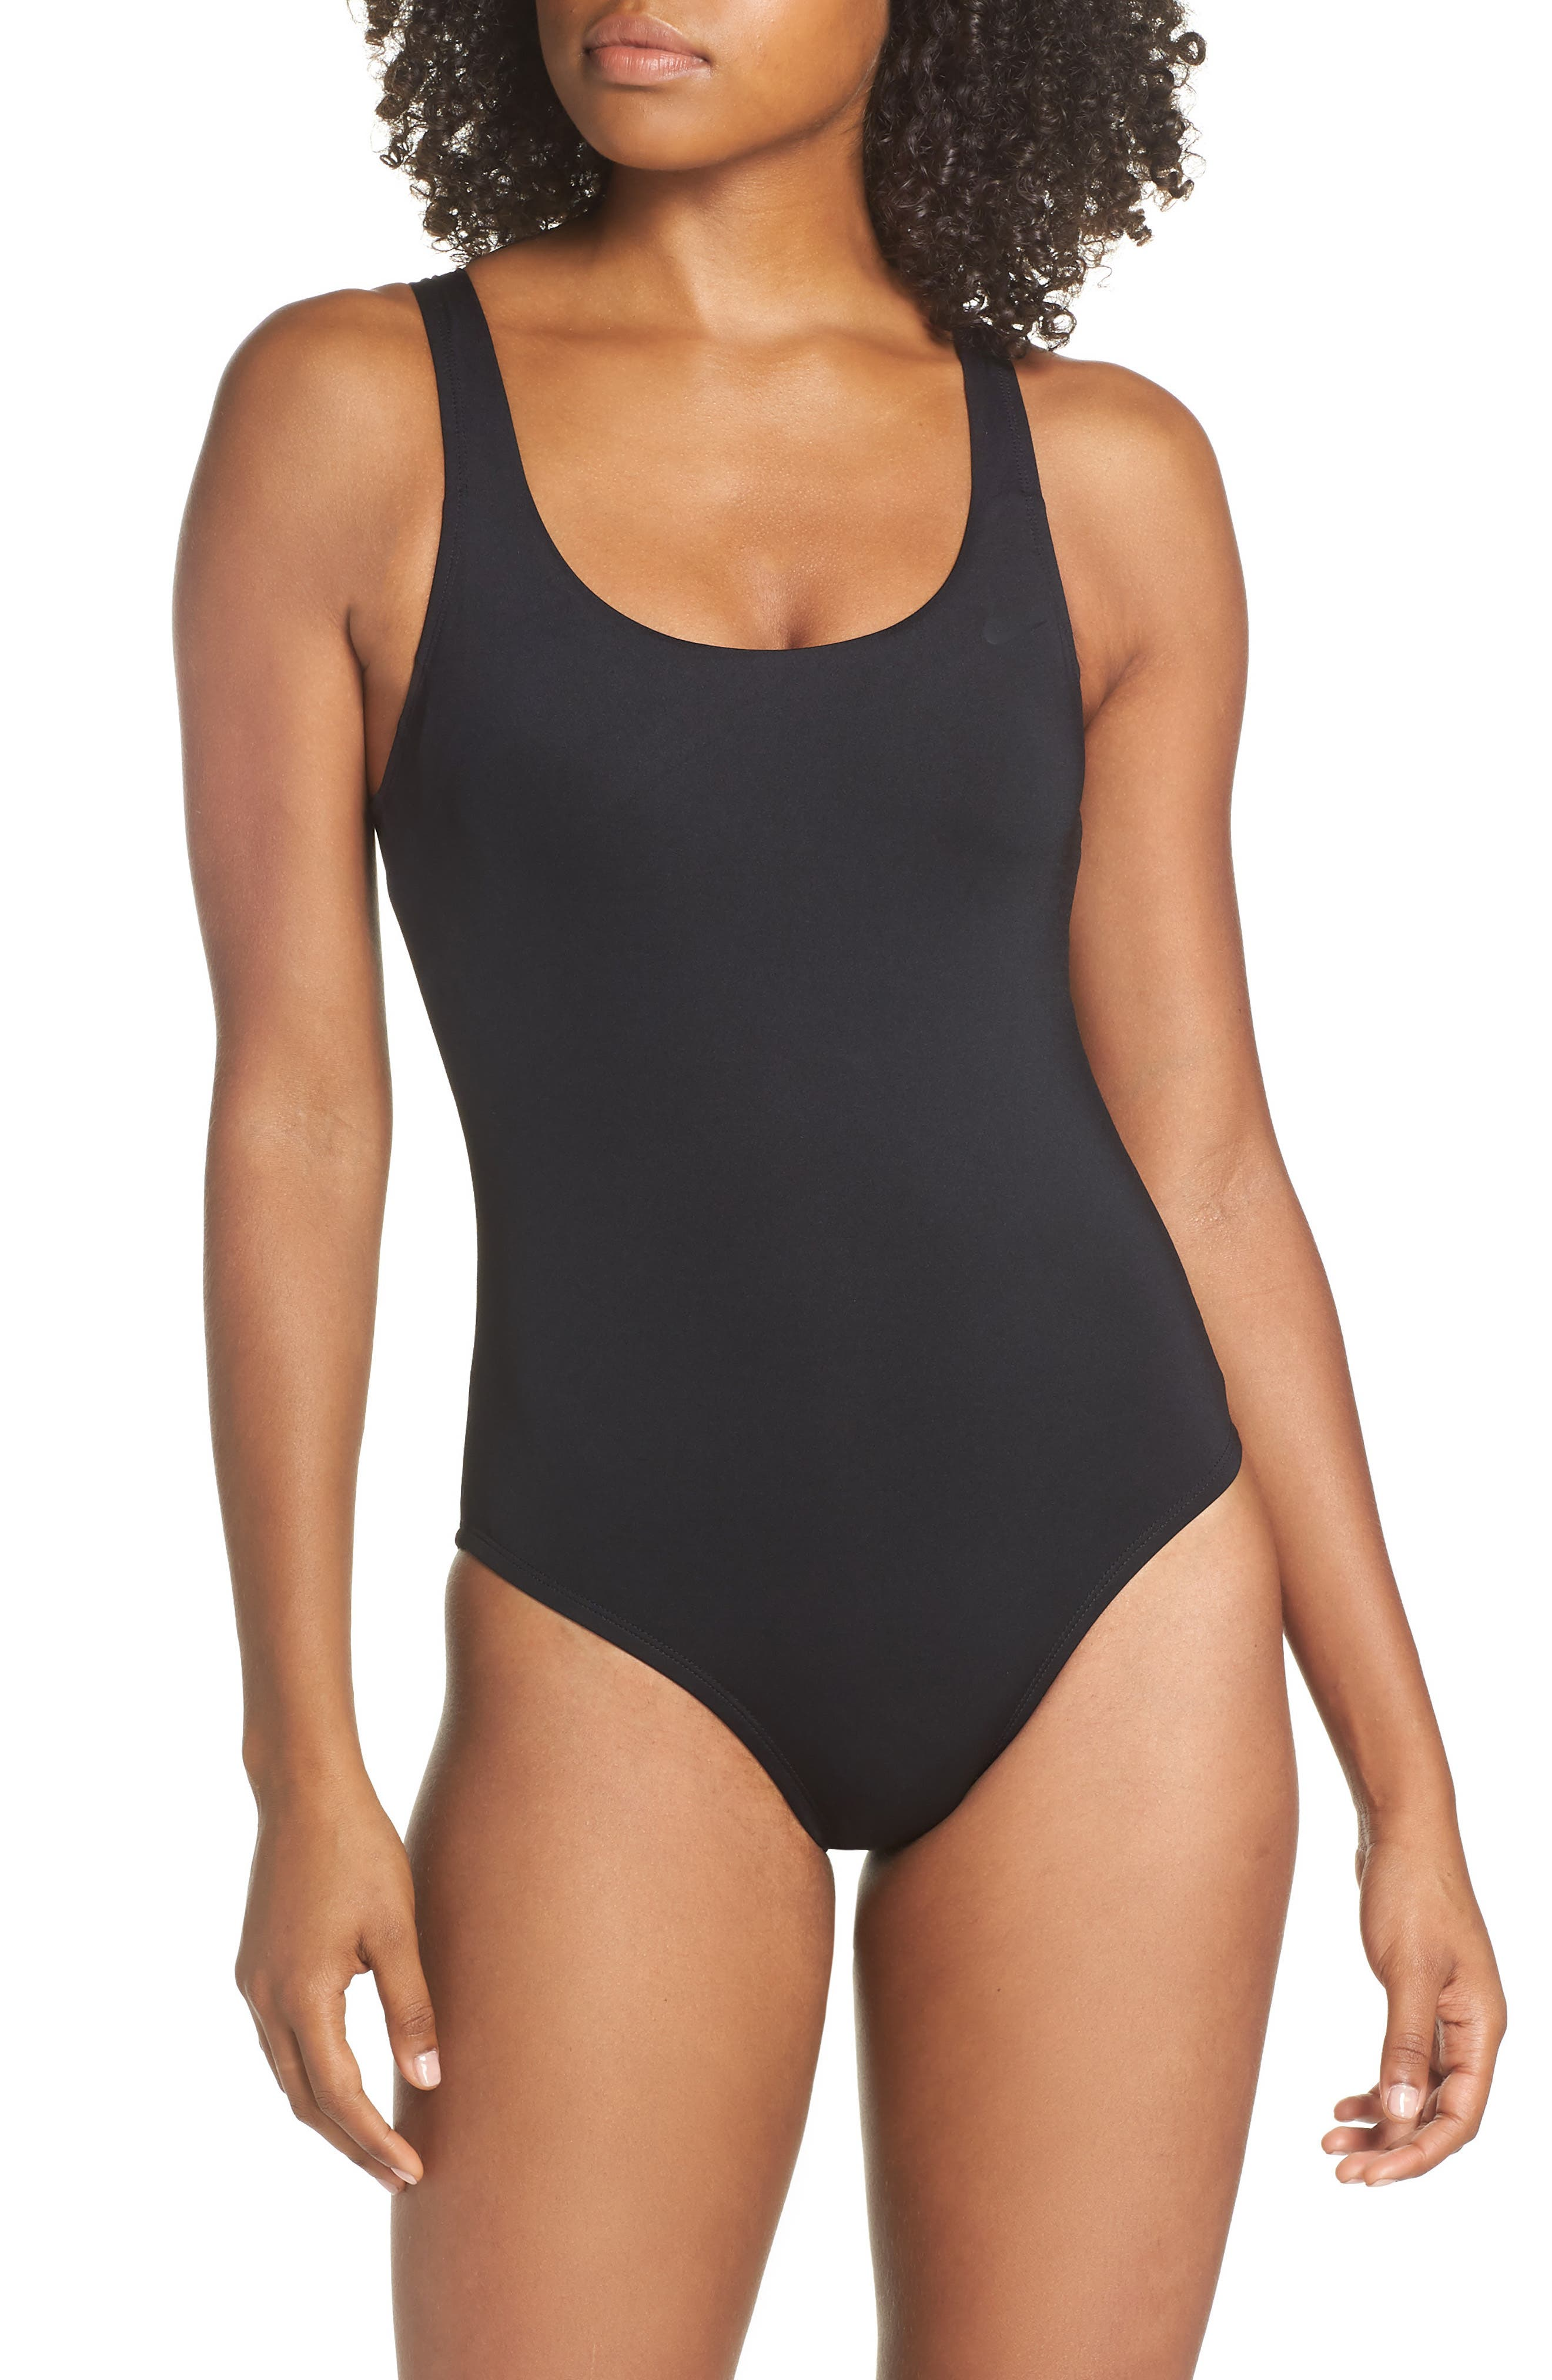 Nike U-Back One-Piece Swimsuit, Black